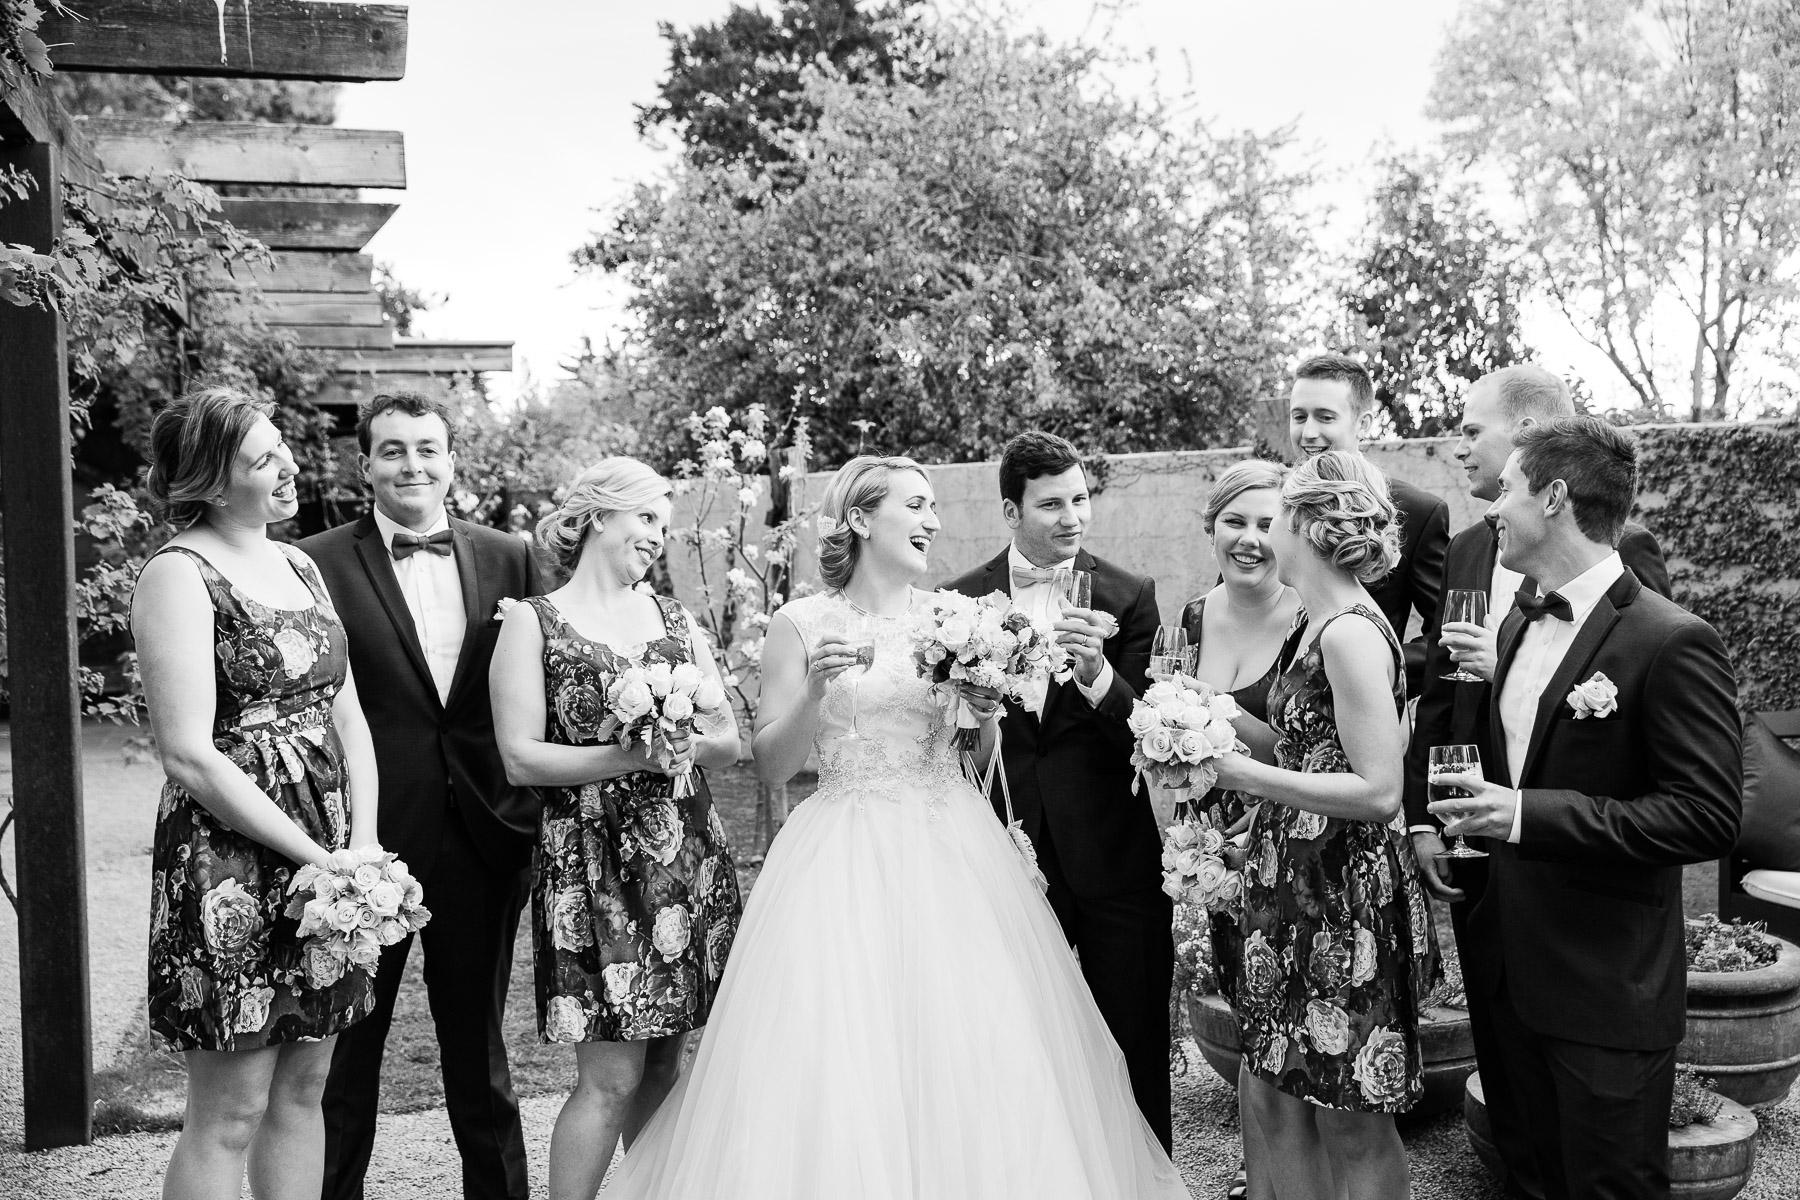 Marnie_and_Charlie_Yarra_Valley_Wedding_Blog-63.jpg